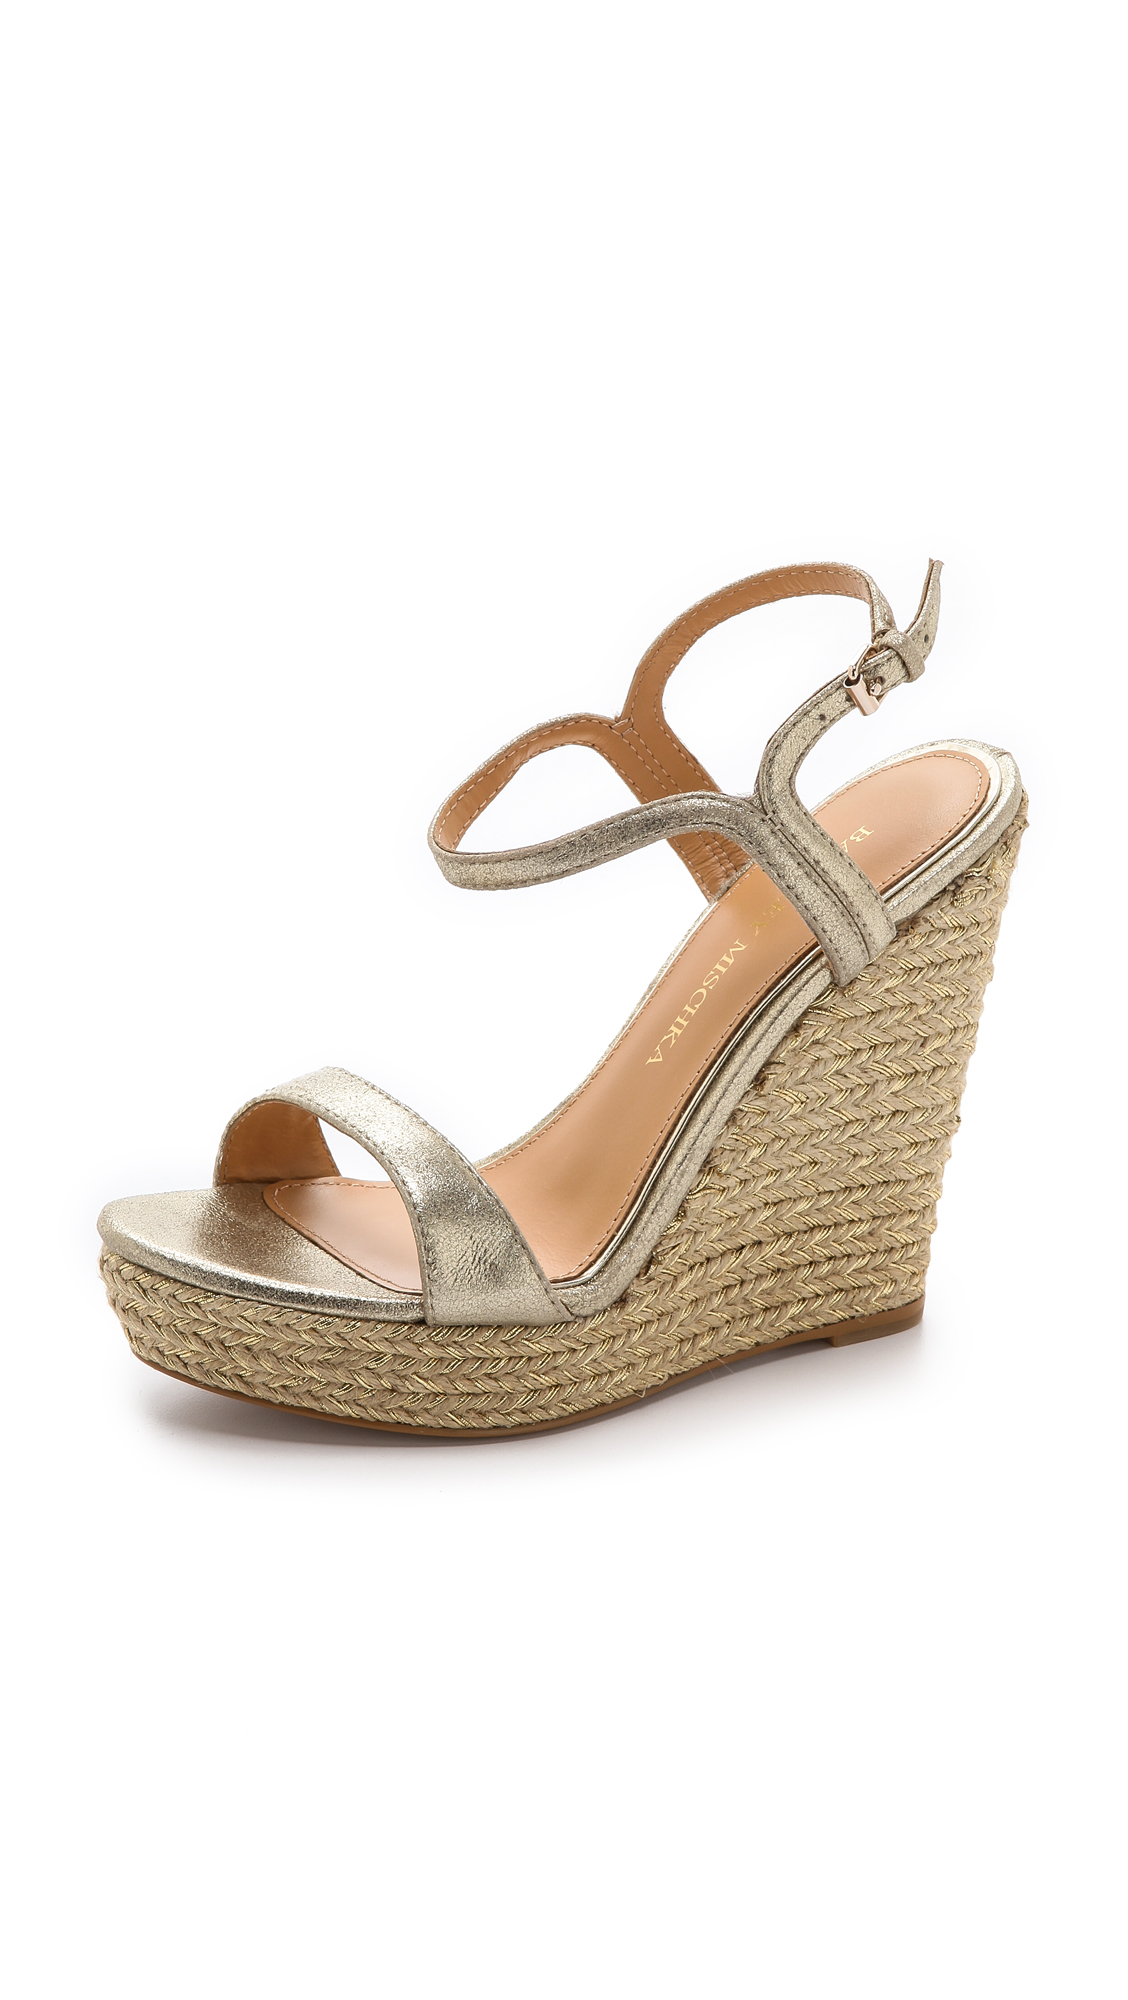 badgley mischka kleo espadrille wedge sandals in beige